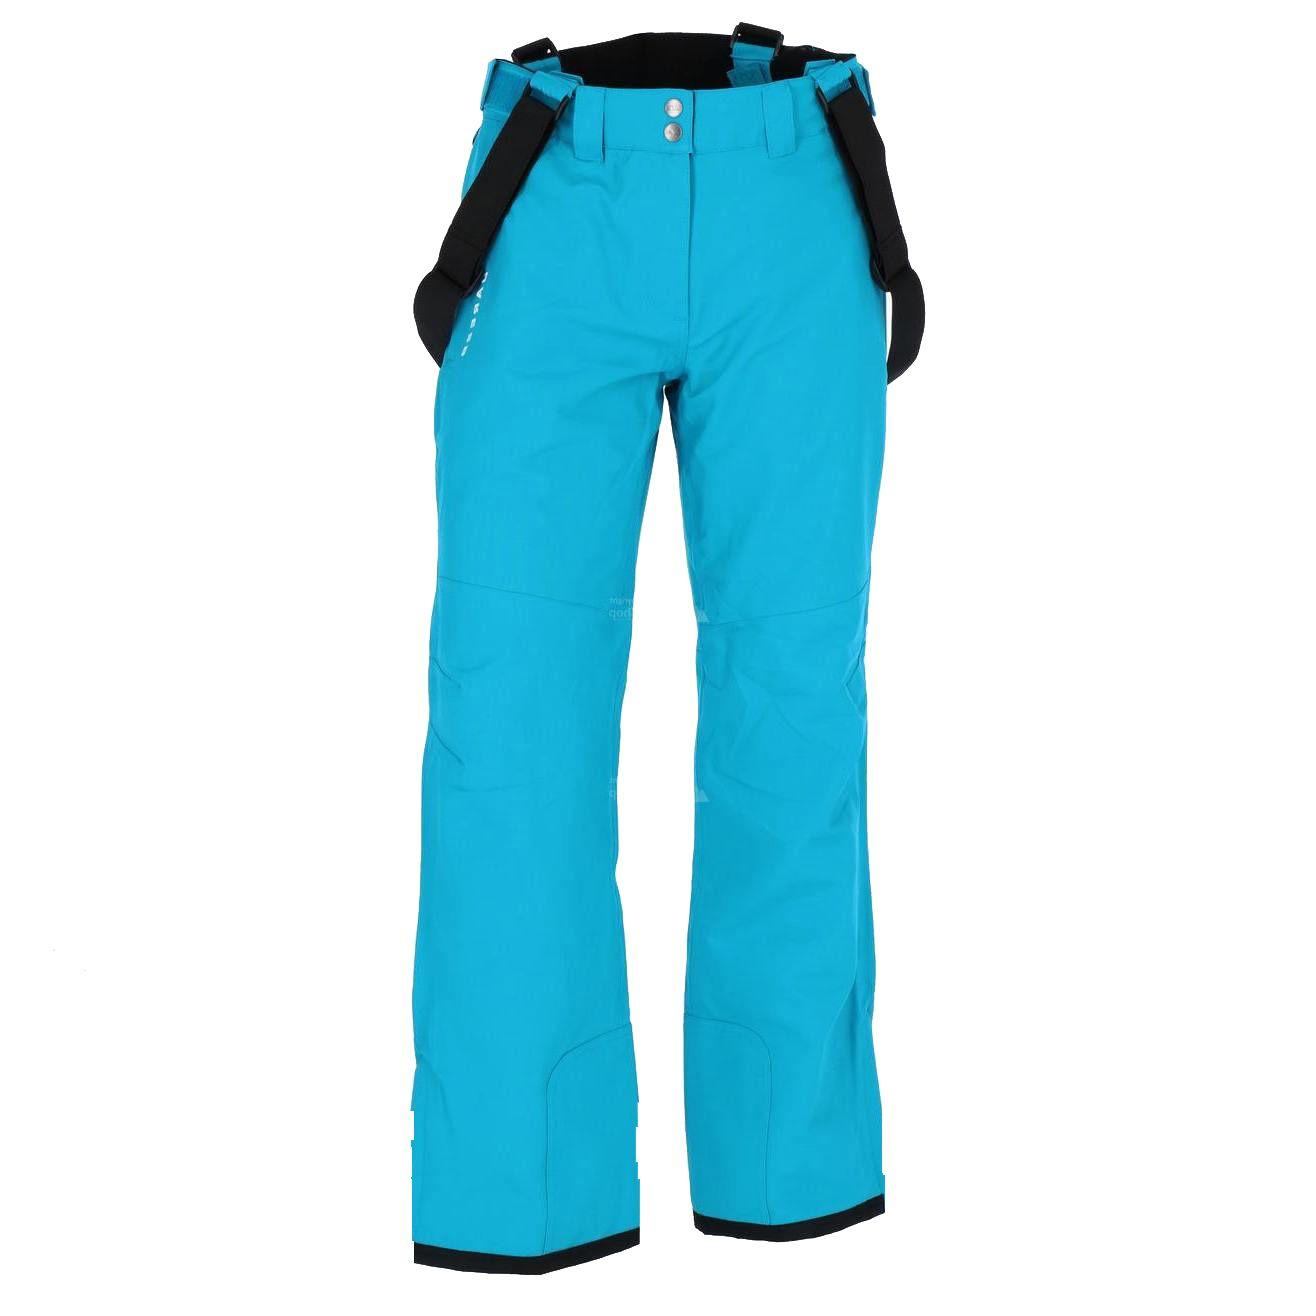 Dare2b-Certify-II-Men-039-s-Waterproof-Breathable-Ski-Trousers-Salopettes thumbnail 5